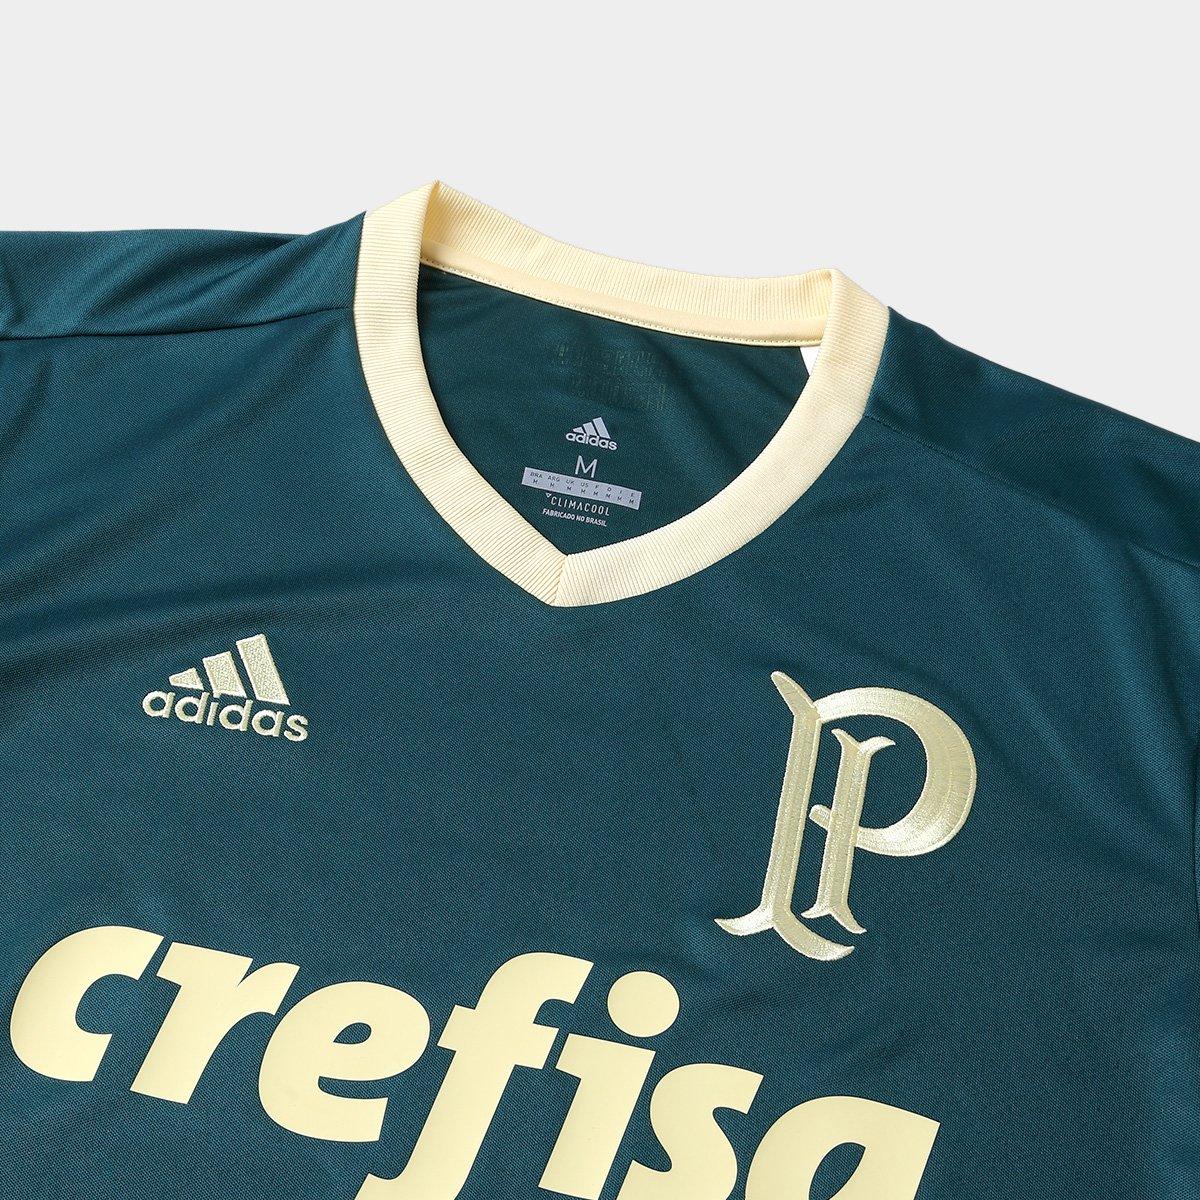 d08abdc482 Camisa Palmeiras III 17 18 s nº Torcedor Adidas Masculina - Verde ...